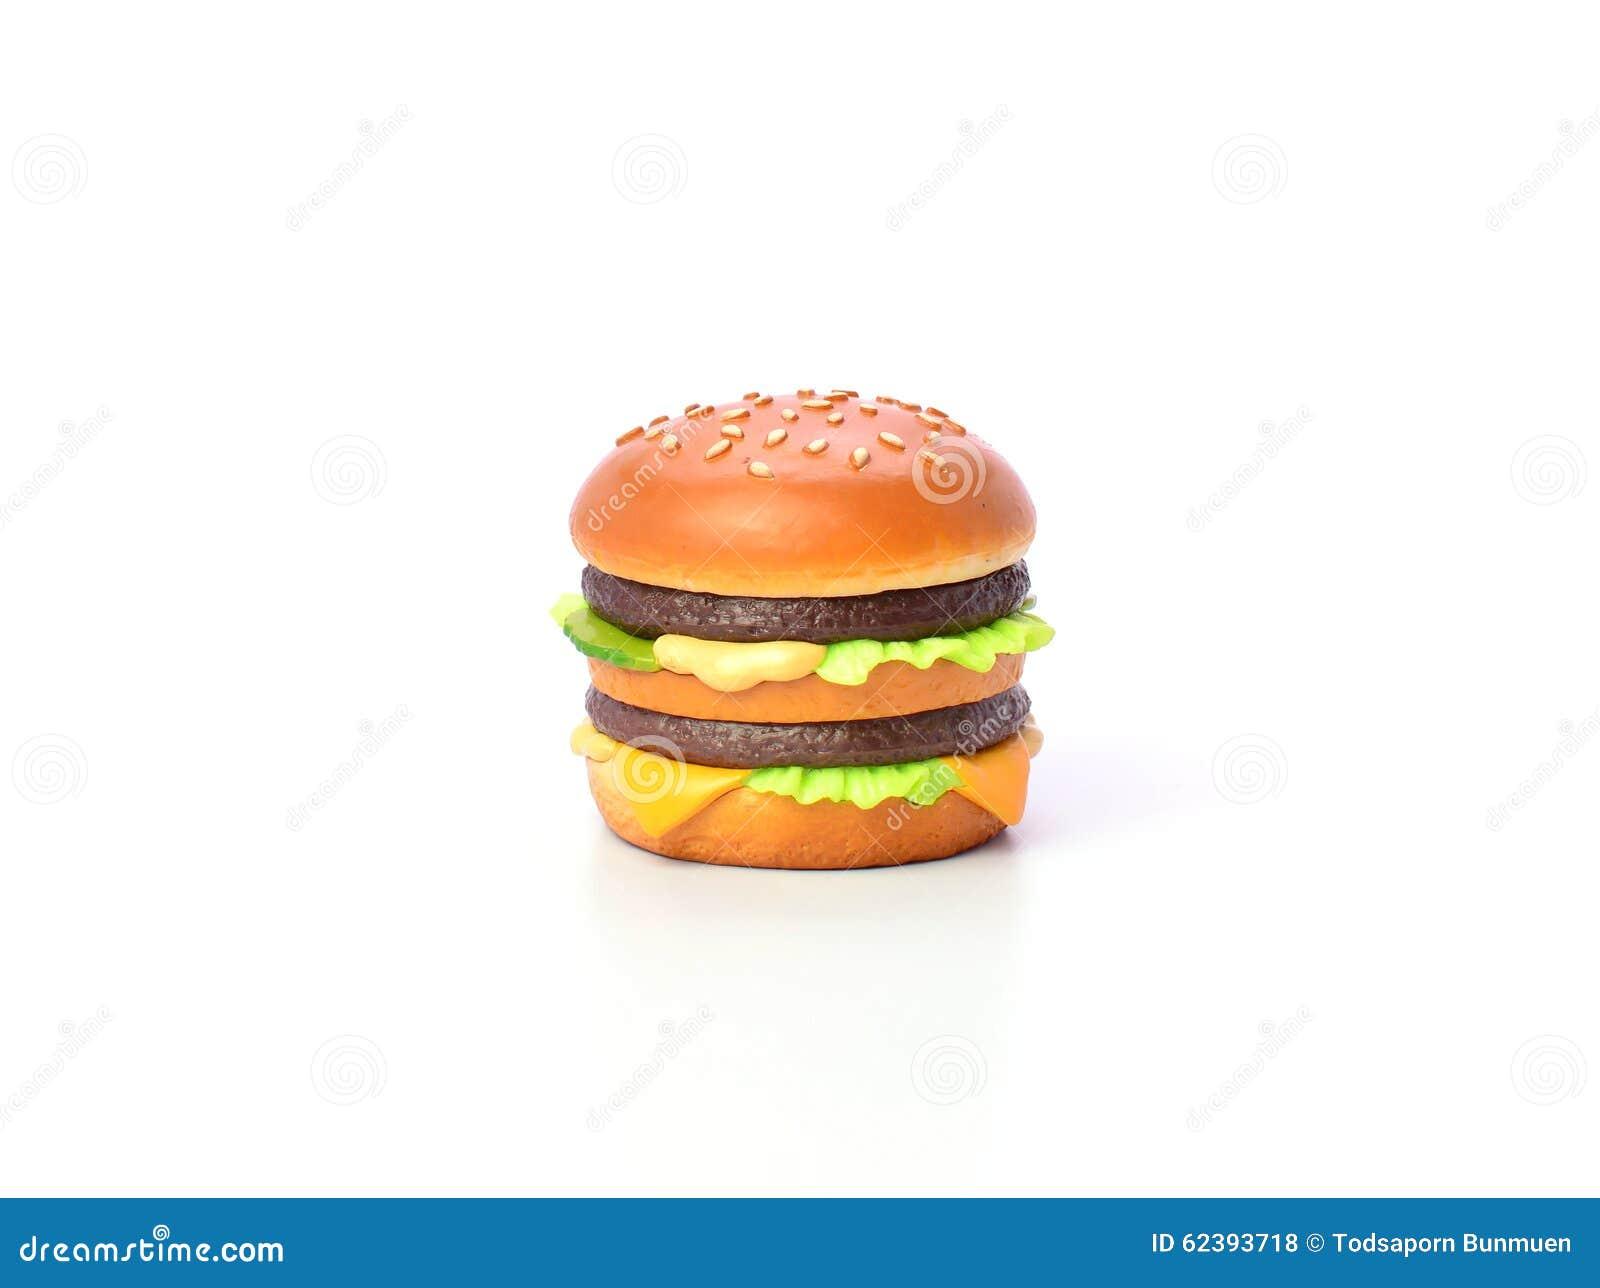 Minihamburgermodel van Japanse klei op witte achtergrond